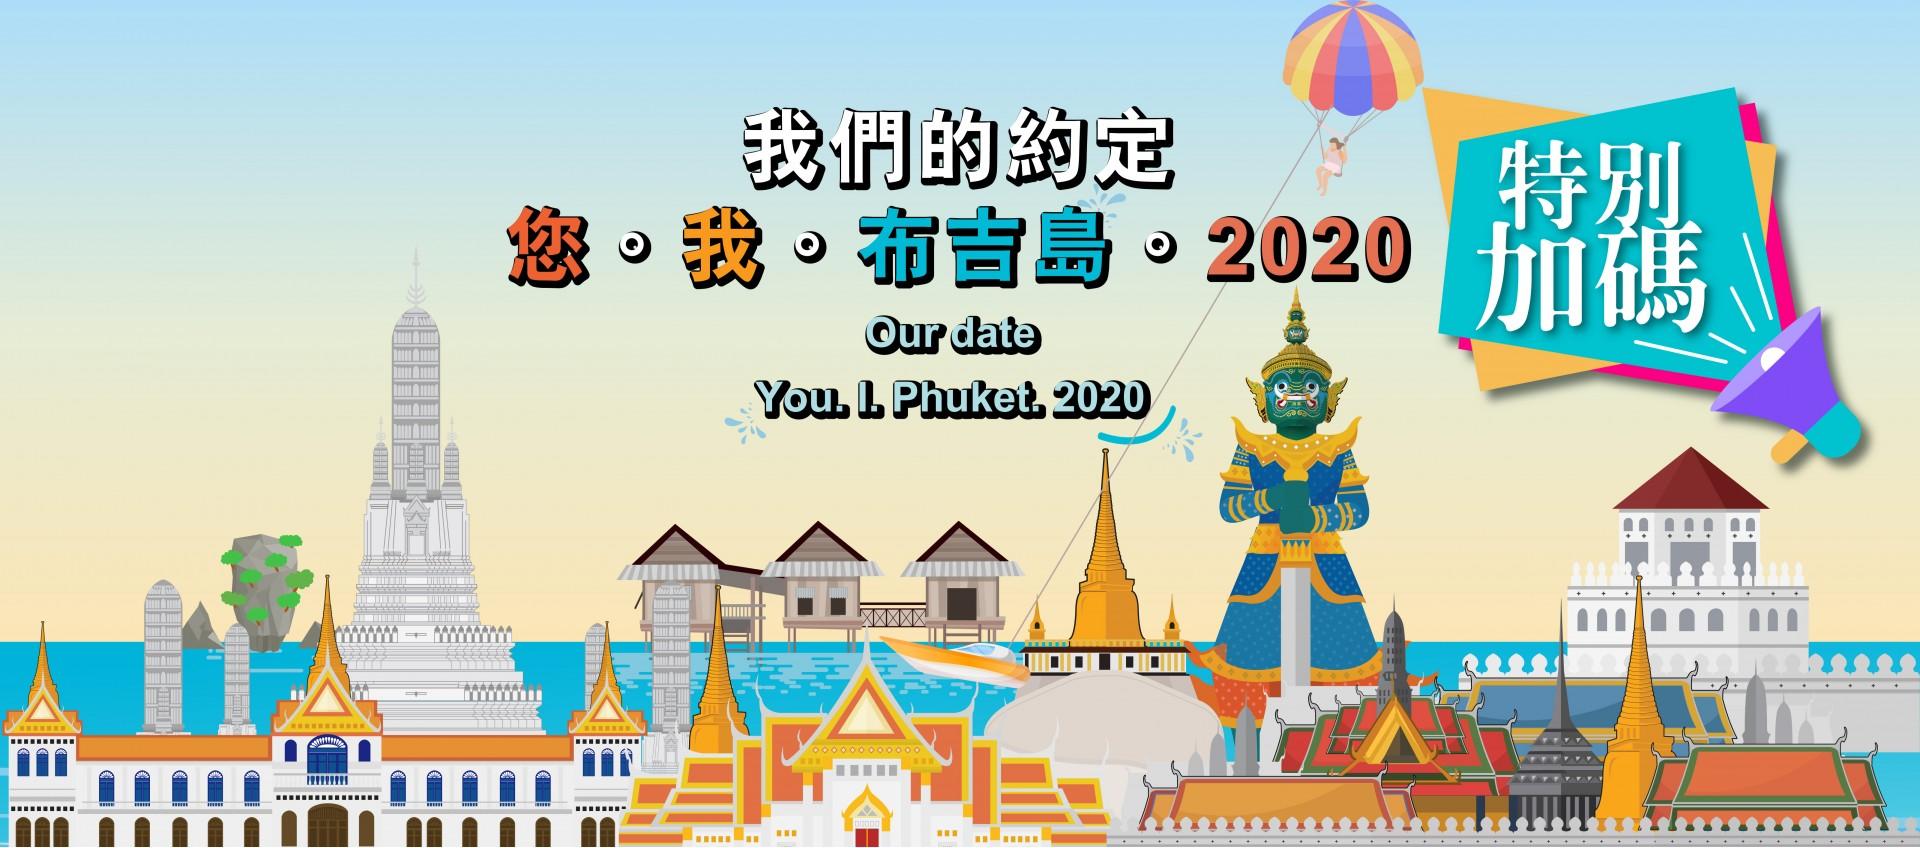 2020 Travel